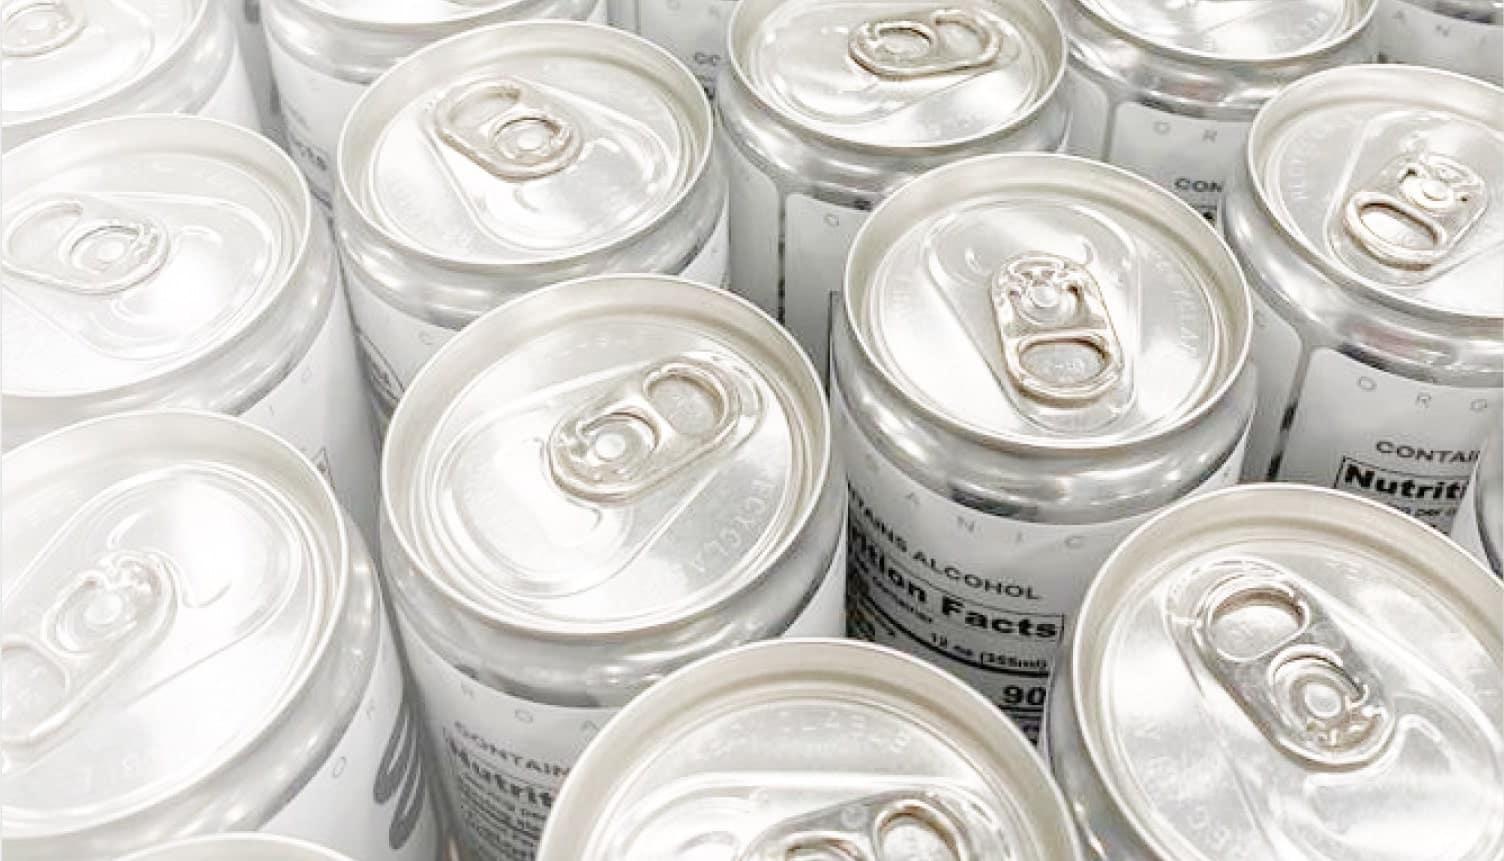 Packaging in 355ML Sleek aluminum cans